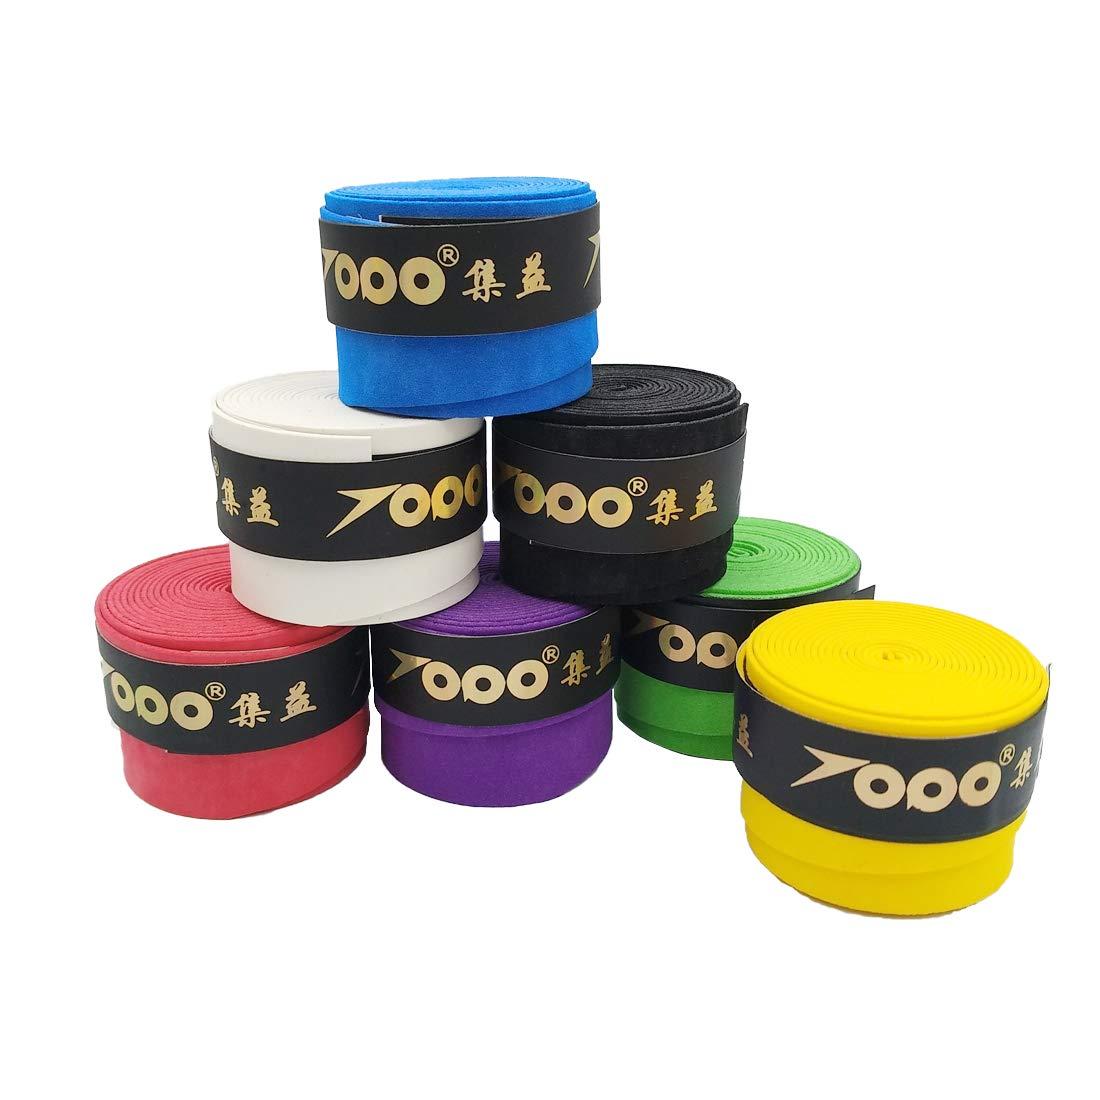 Towel Grip Tape Badminton Pro Handle Replacement Sweat-absorbent Practical